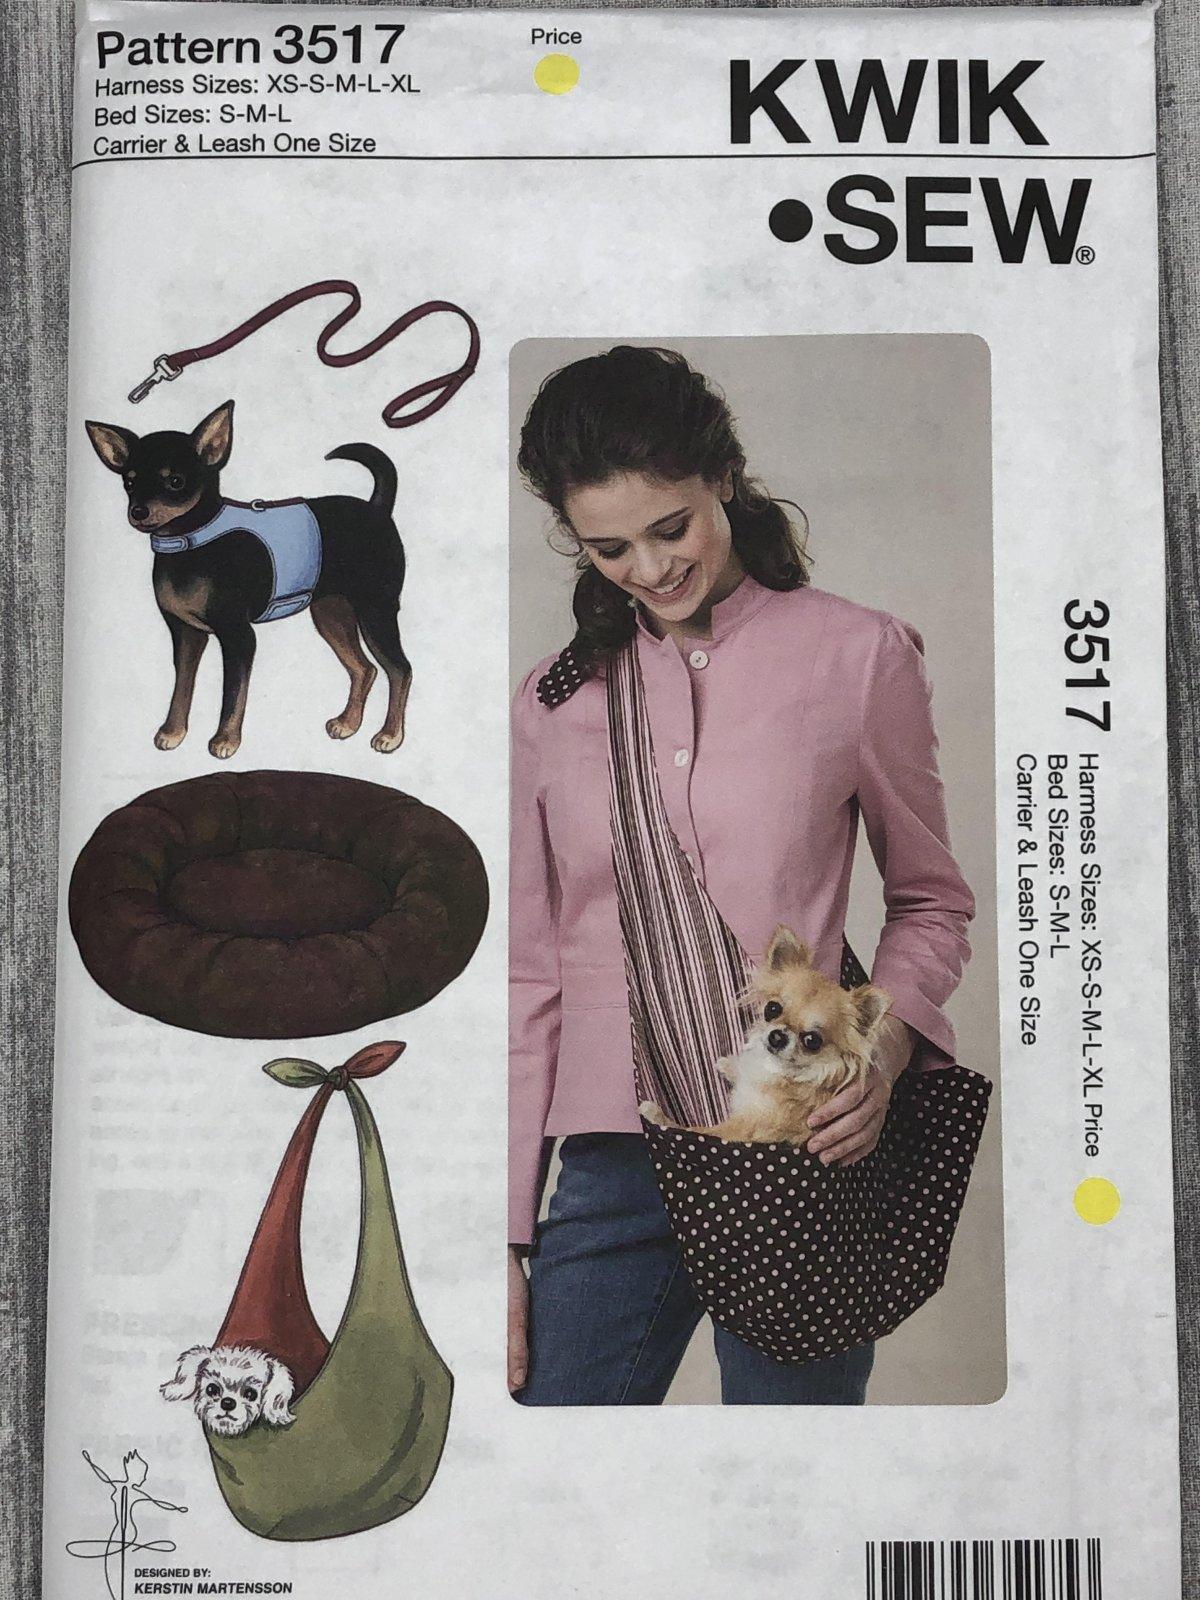 Kwik Sew 3517 Harness Sizes XS-XL Bed Sizes S-L